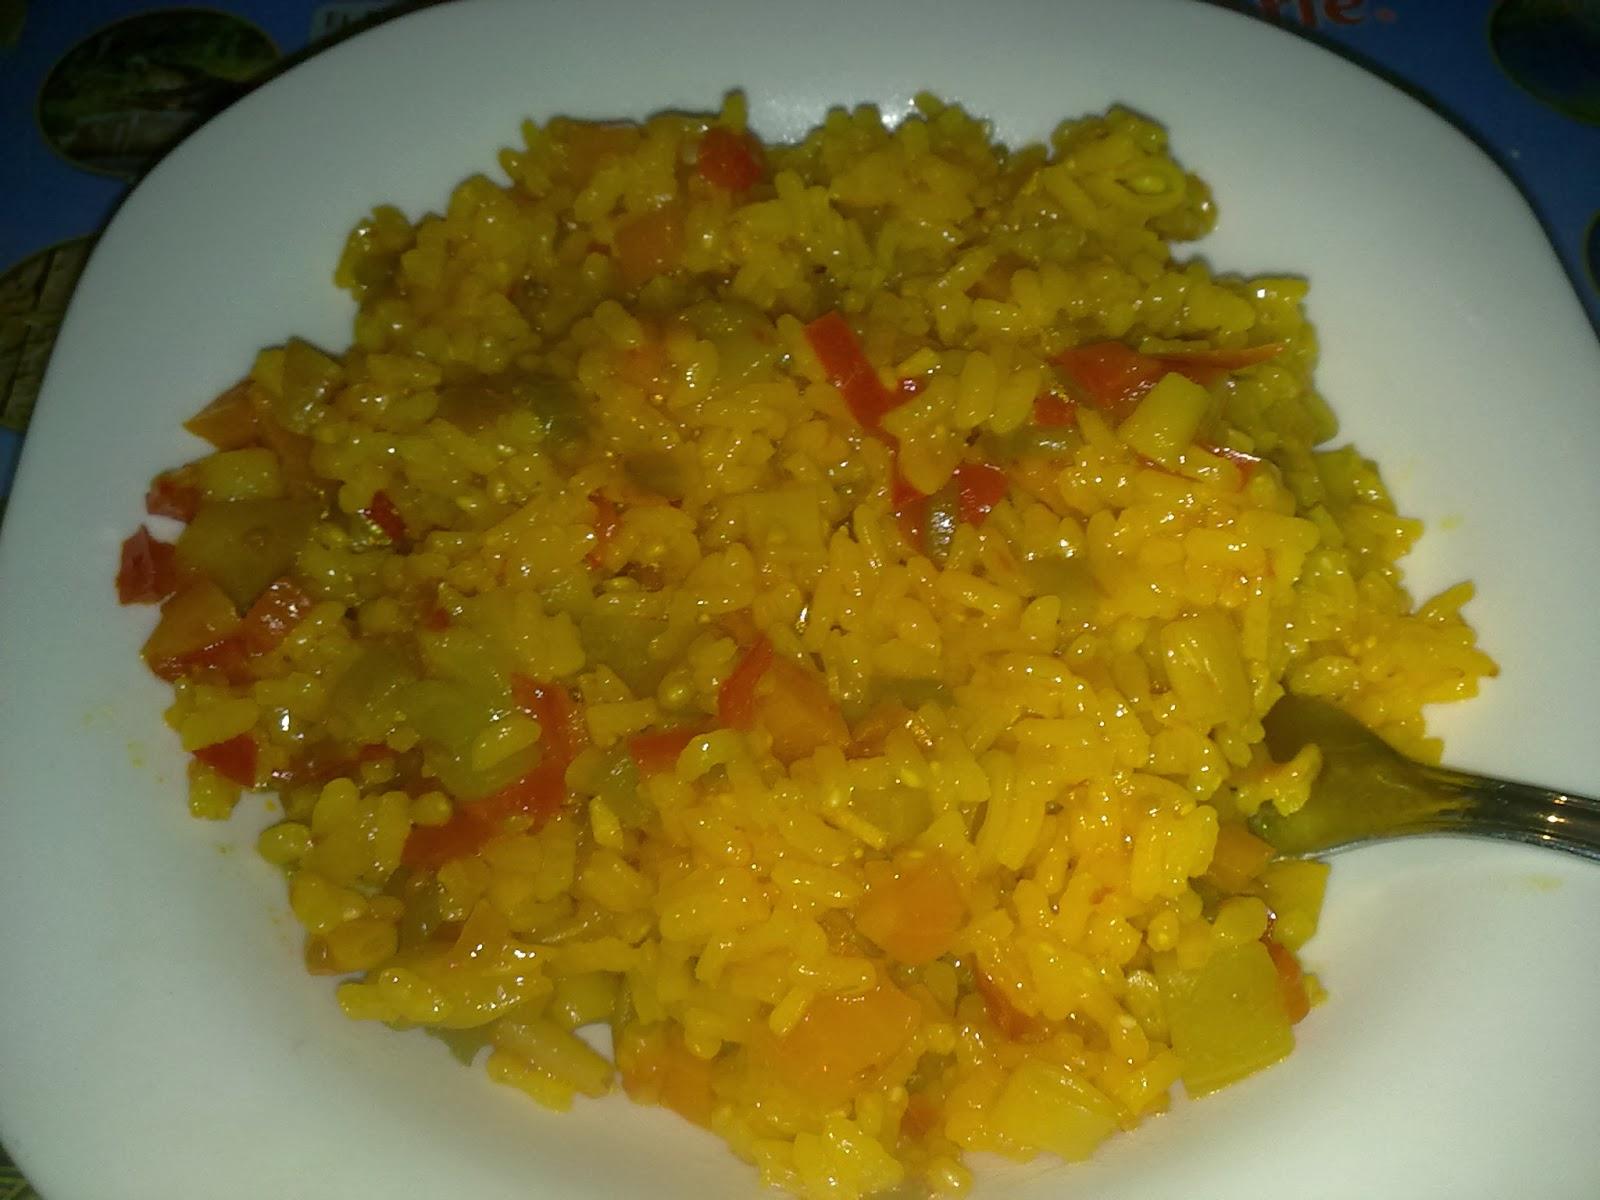 La cocina nomada paella de verduras for Como hacer paella de verduras